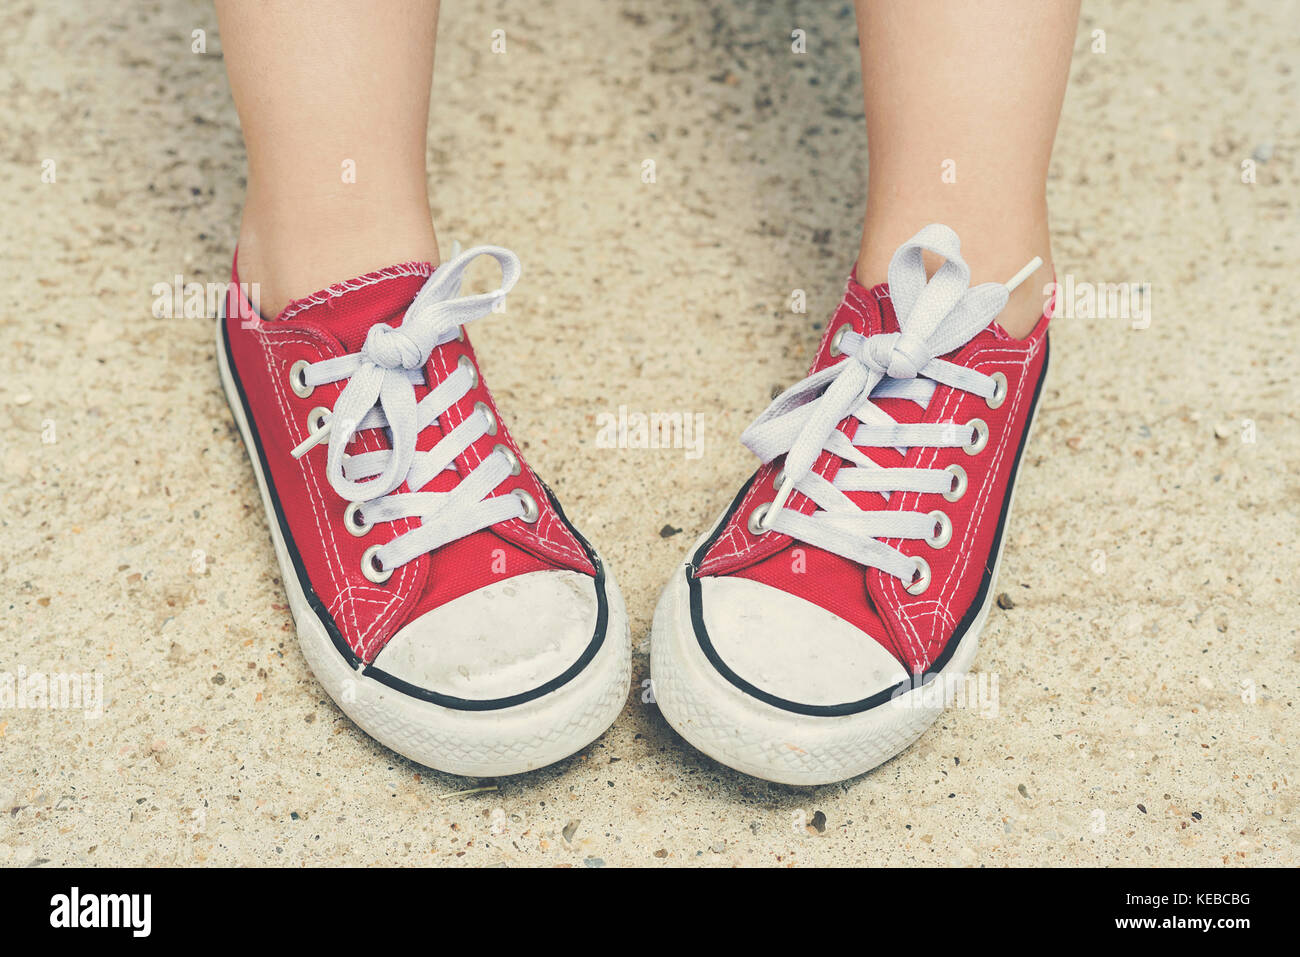 Child with sneakers. Child with red sneakers Child with sneakers. Child with red sneakers - Stock Image